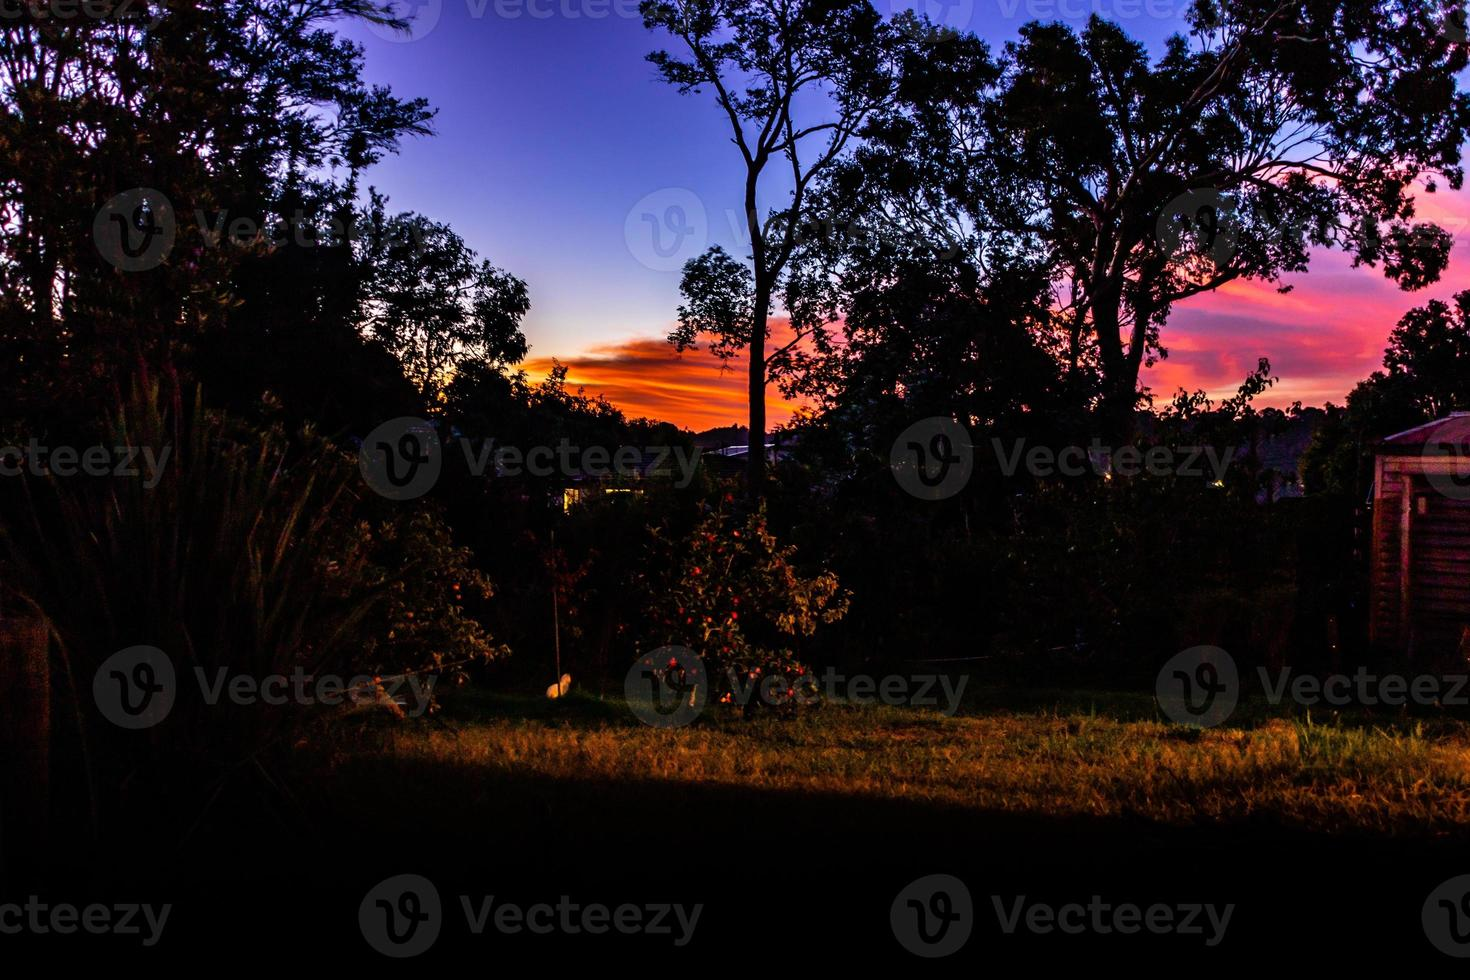 Sun setting over the back yard. Ranui, Auckland, New Zealand photo